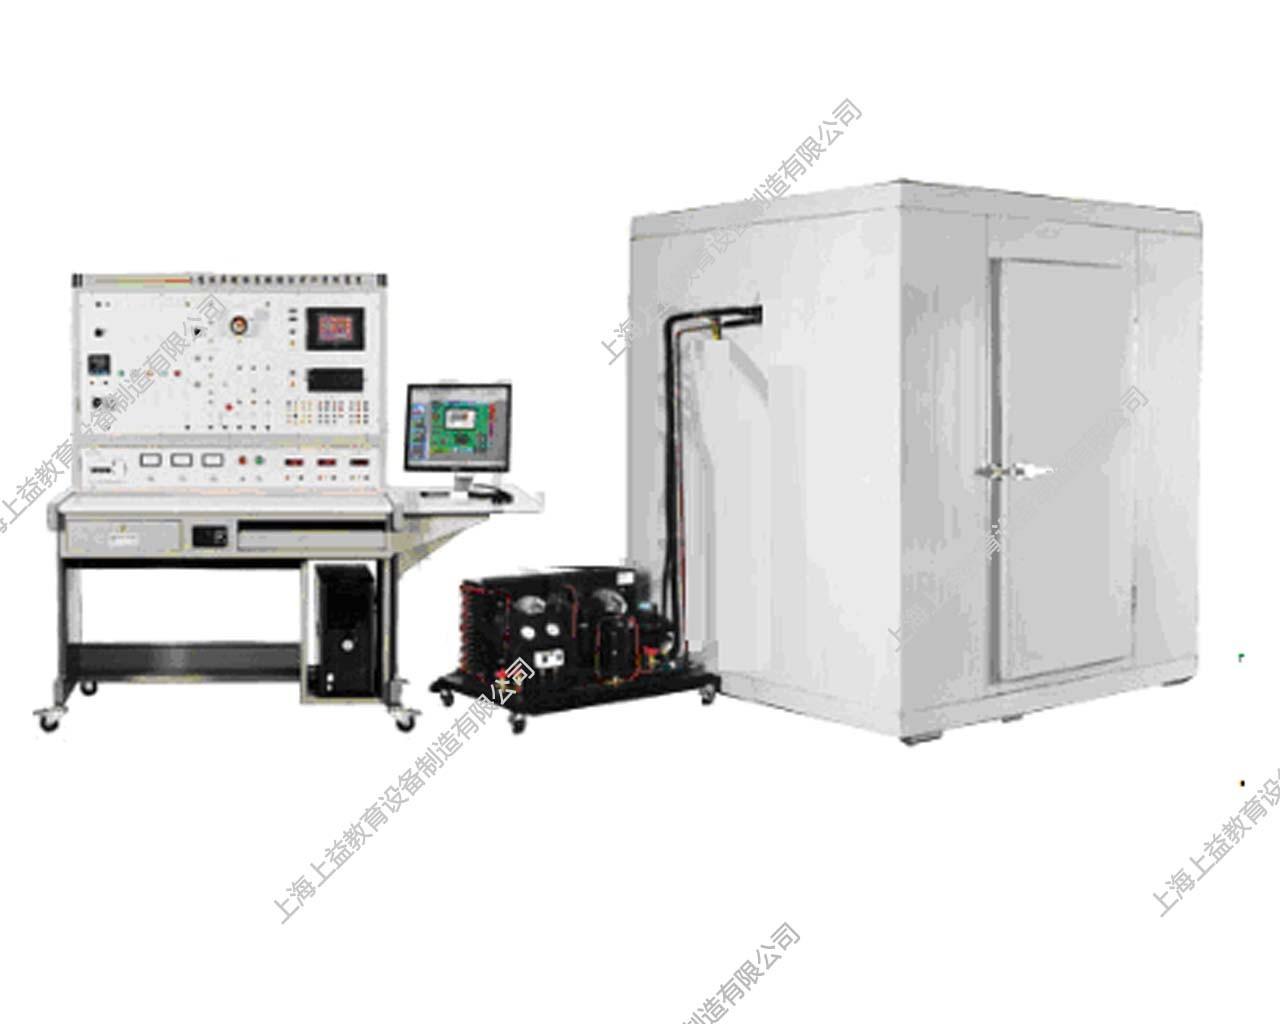 SY-22G  小型冷库制冷系统综合wwwlehu8viplehu68vip装置(三菱)